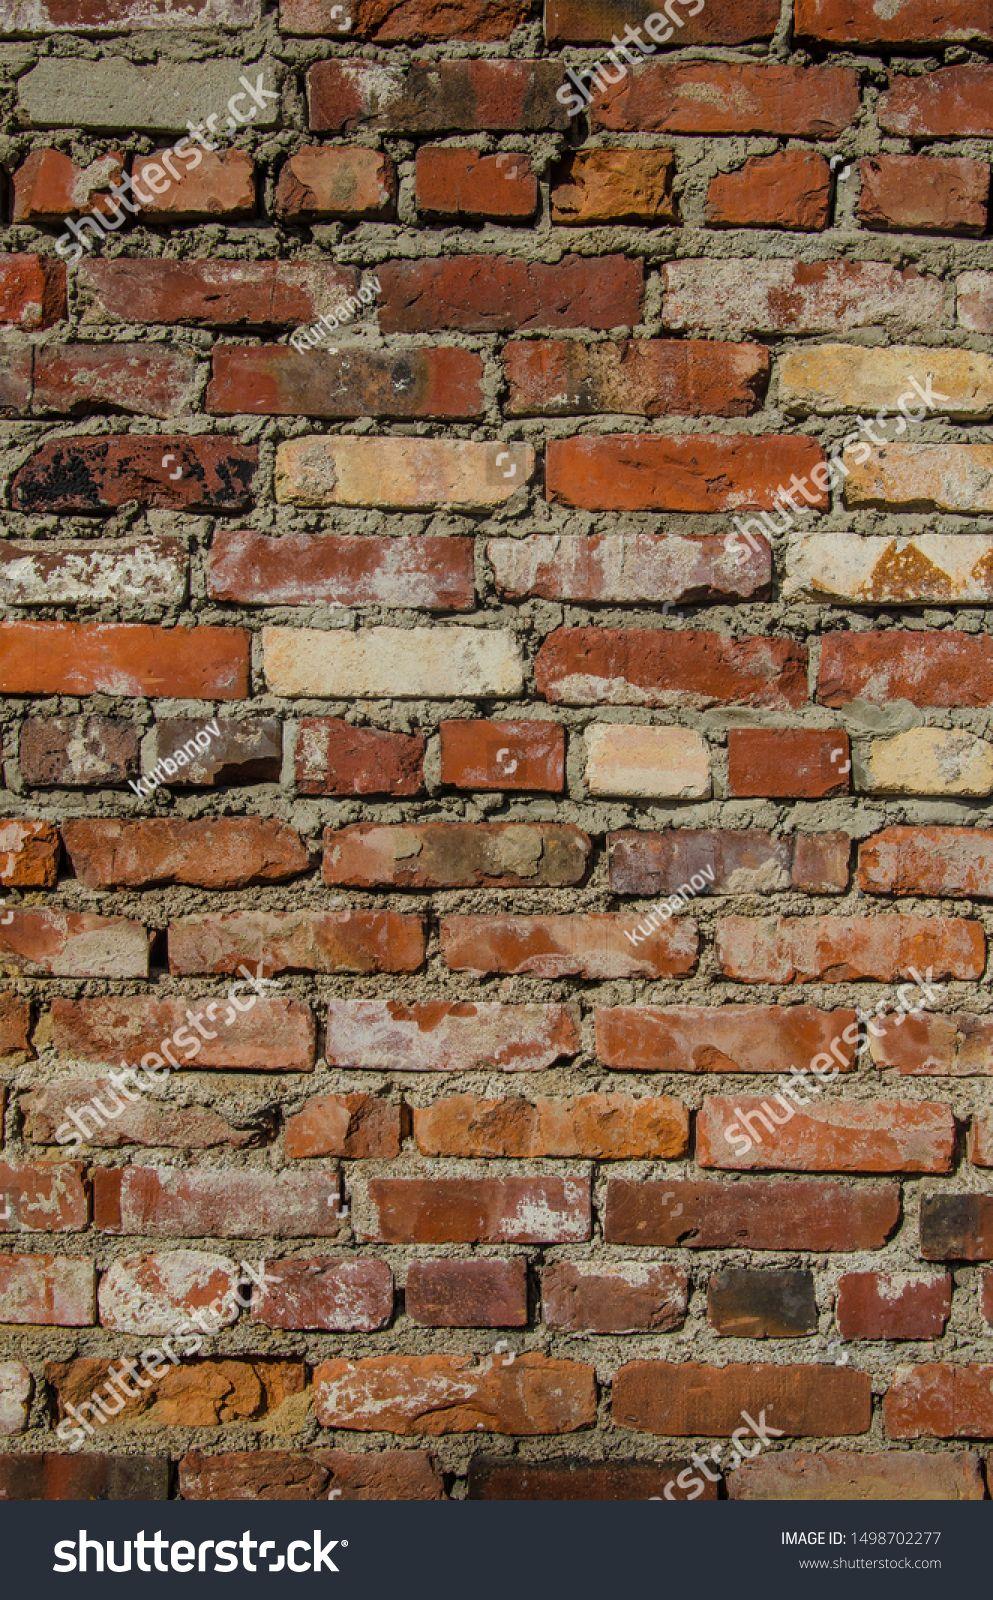 Red Brick Wall Texture Grunge Background Stock Photo Edit Now 1498702277 Red Brick Wallpaper Red Brick Walls Textured Walls